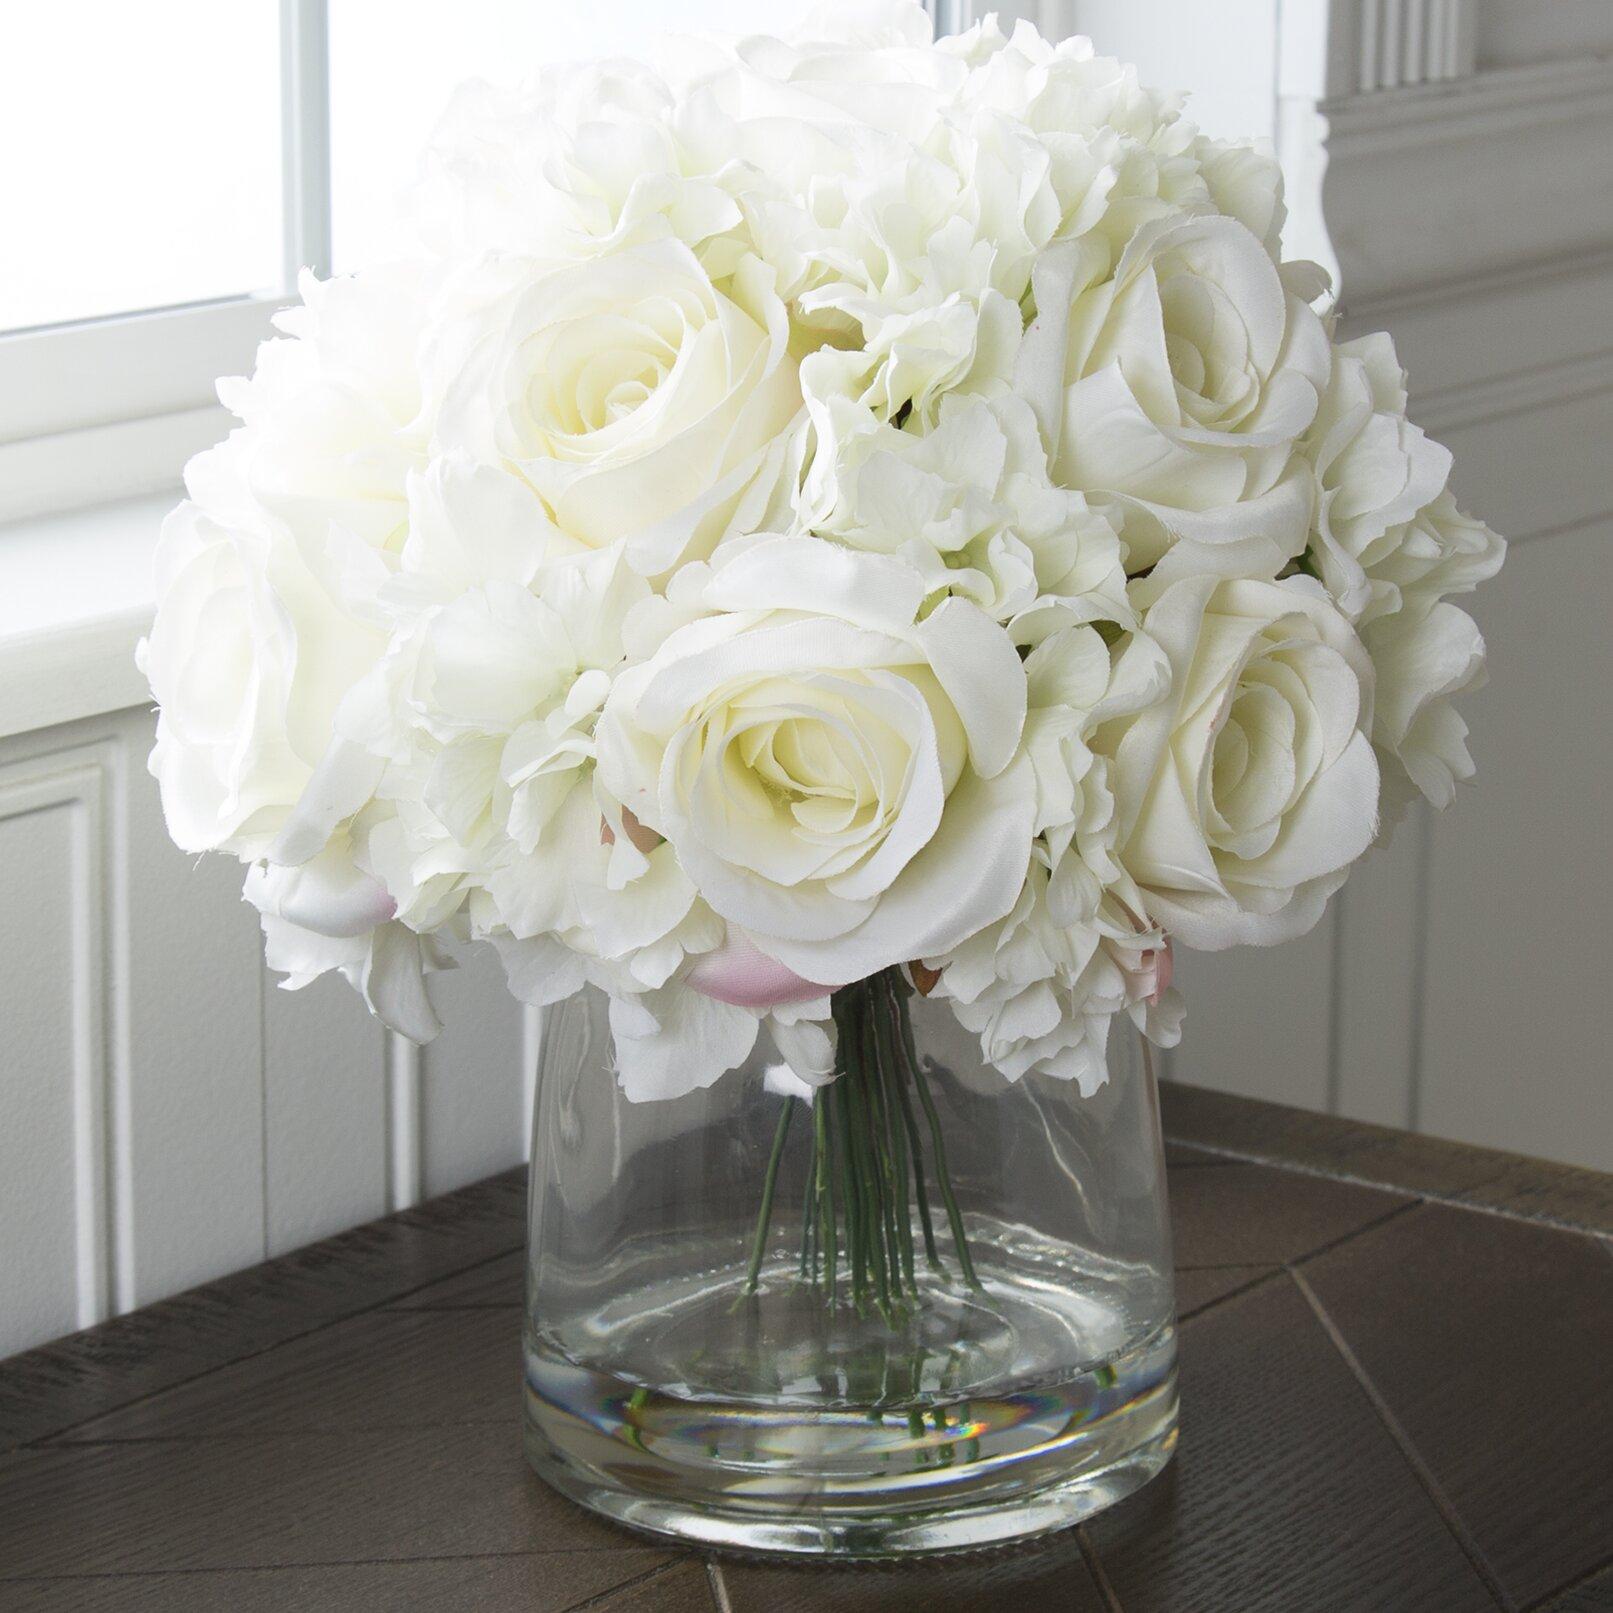 Pure garden hydrangea and rose arrangement in glass vase